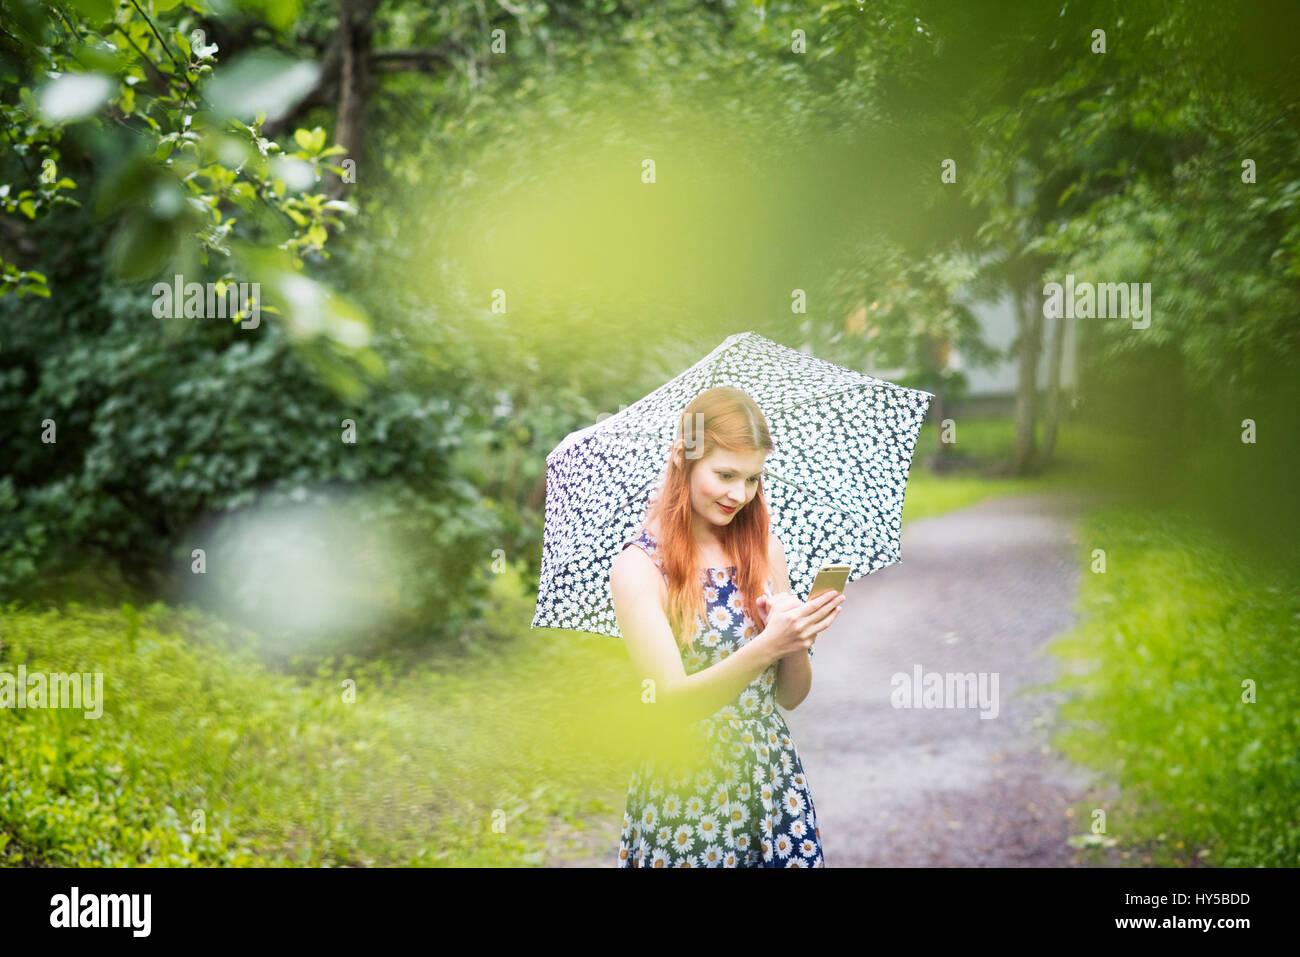 Finnland, Pirkanmaa, Tampere, Frau mit geblümten Kleid mit Regenschirm in Park Stockbild